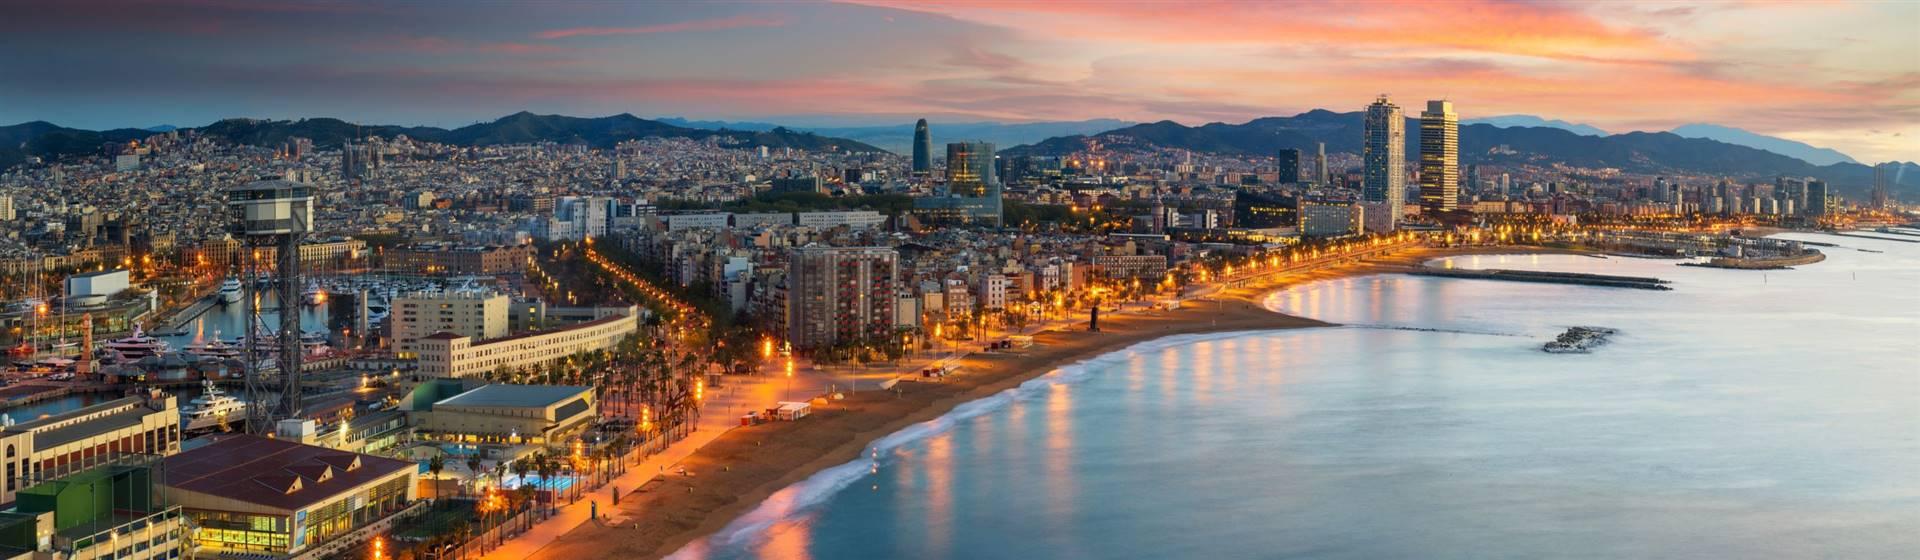 "<img src=""barcelonaspain-shutterstocklr.jpeg"" alt=""Barcelona - Spain""/>"